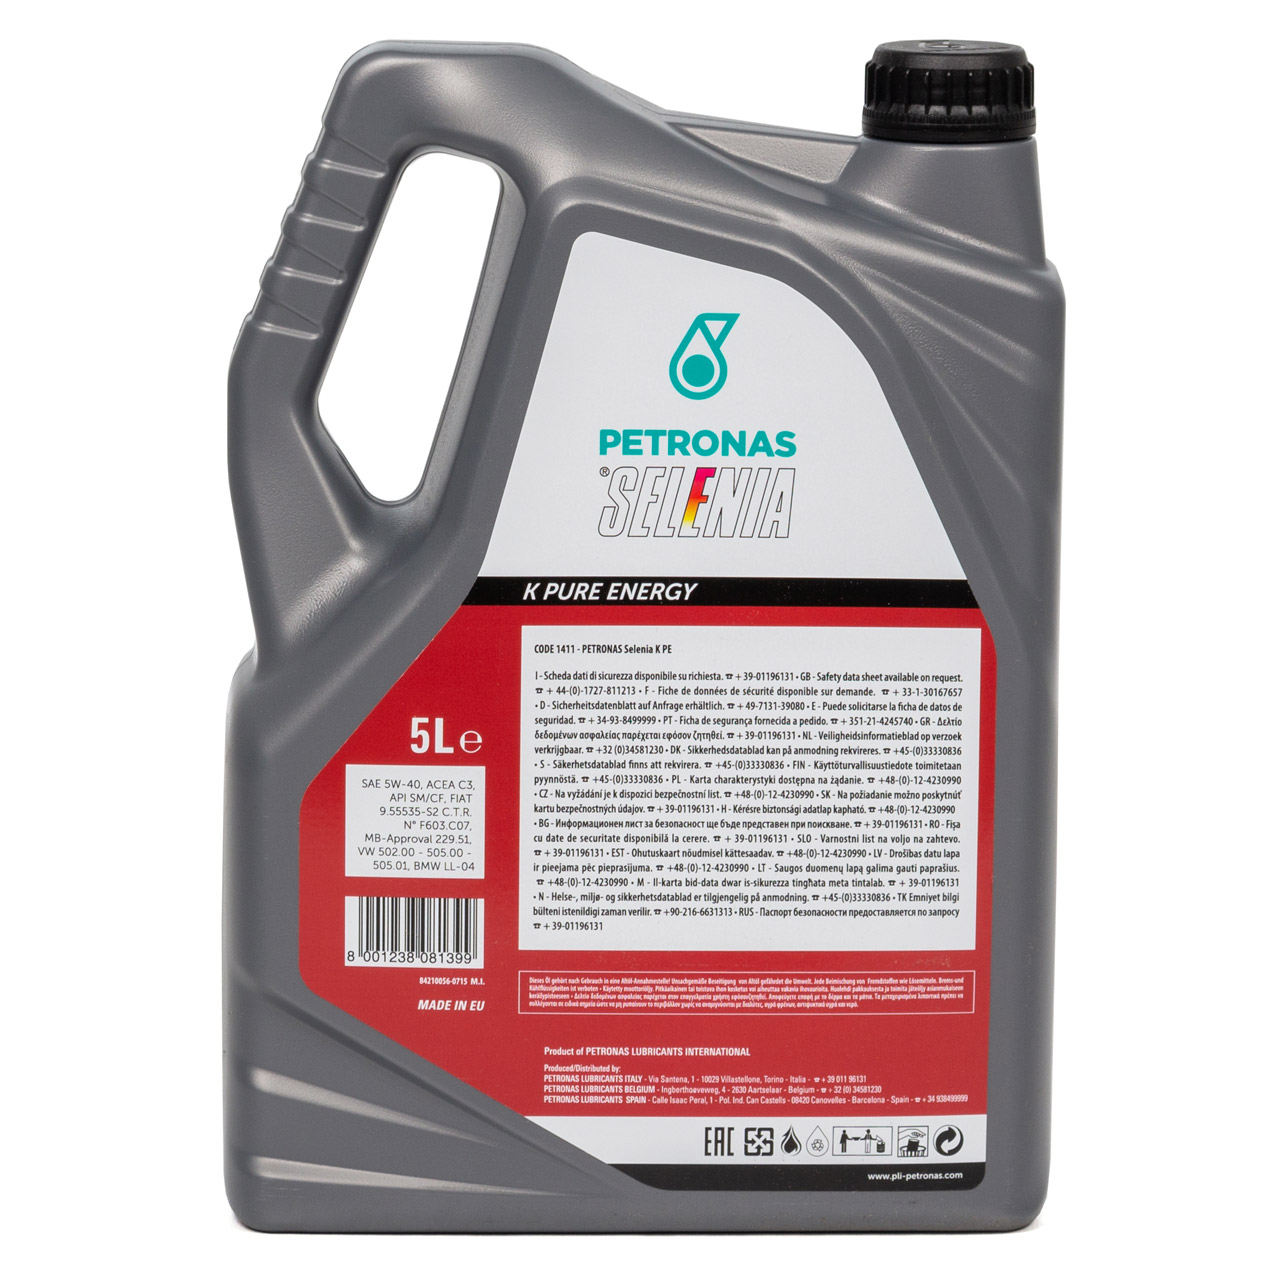 PETRONAS SELENIA Motoröl Öl K PURE ENERGY 5W40 5W-40 Fiat 9.55535-S2 - 5 Liter